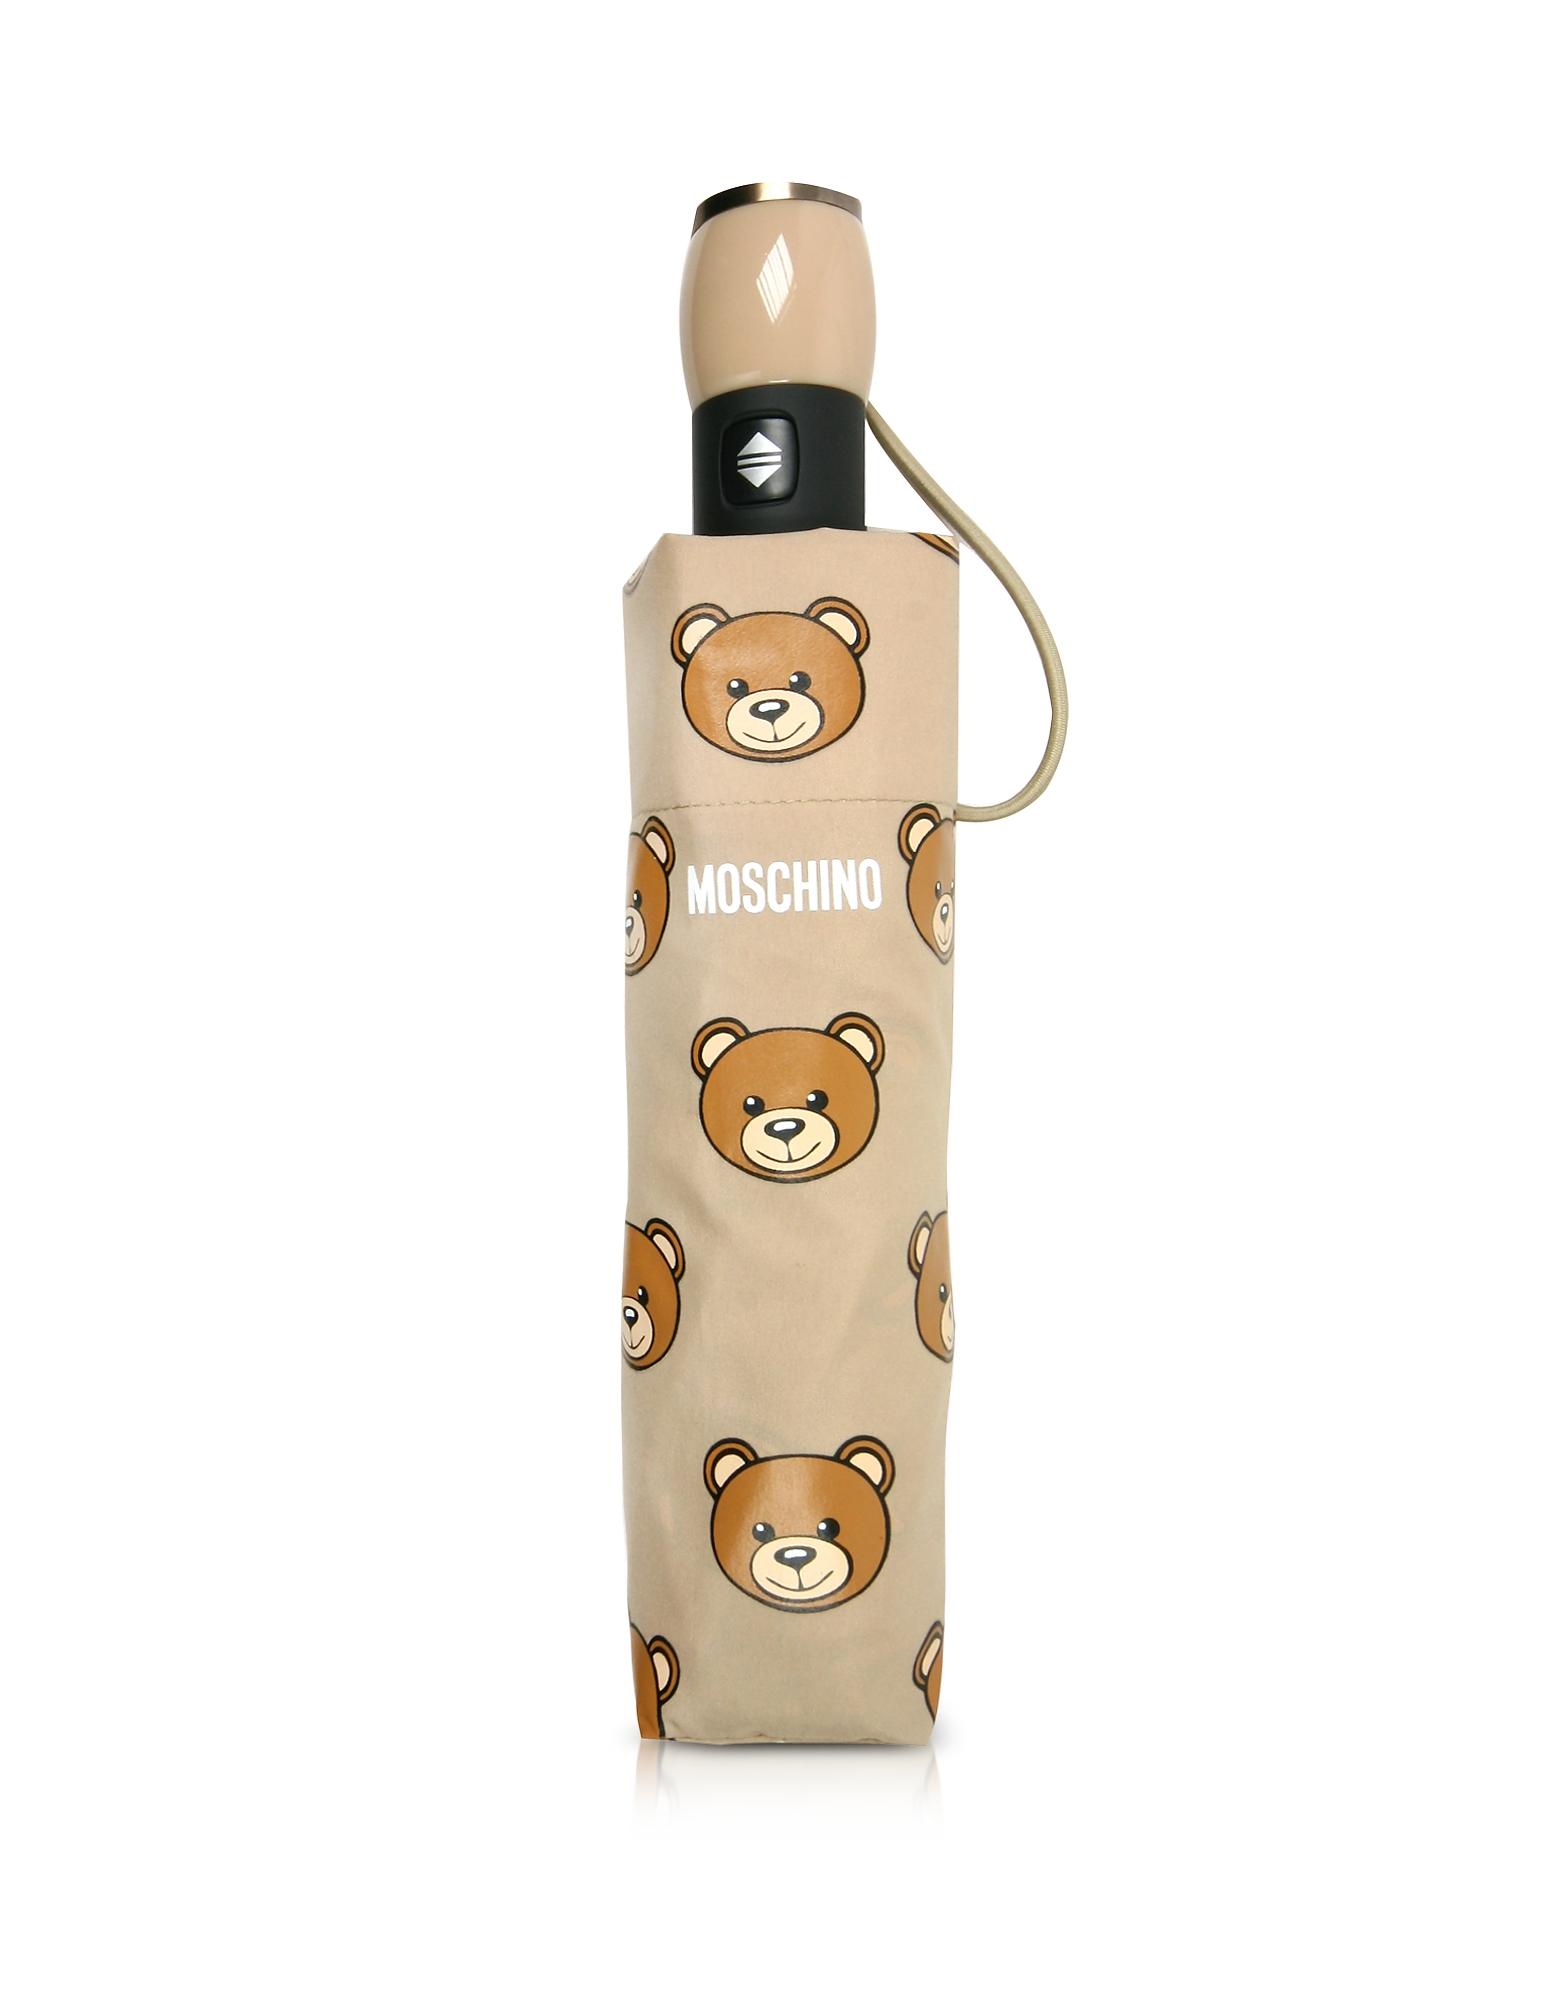 Moschino Umbrellas, Teddy Heads Dark Beige Mini Umbrella